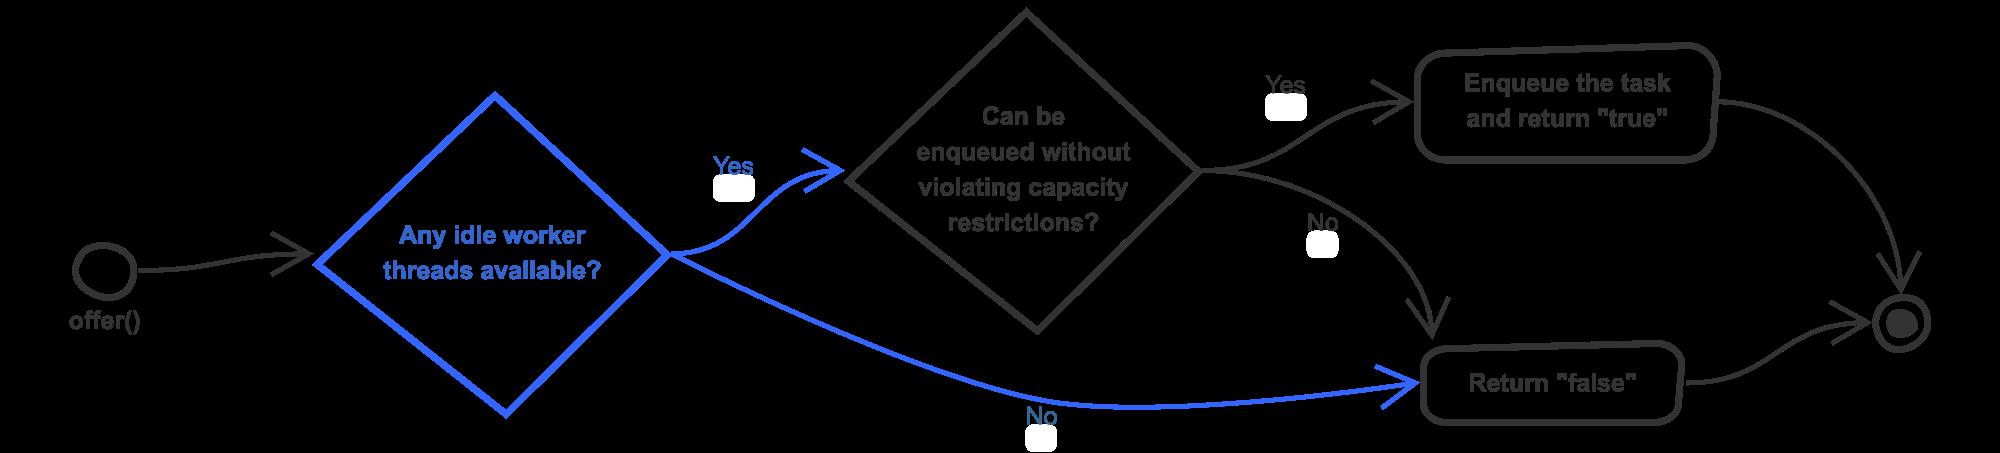 Modified behaviour of offer() method